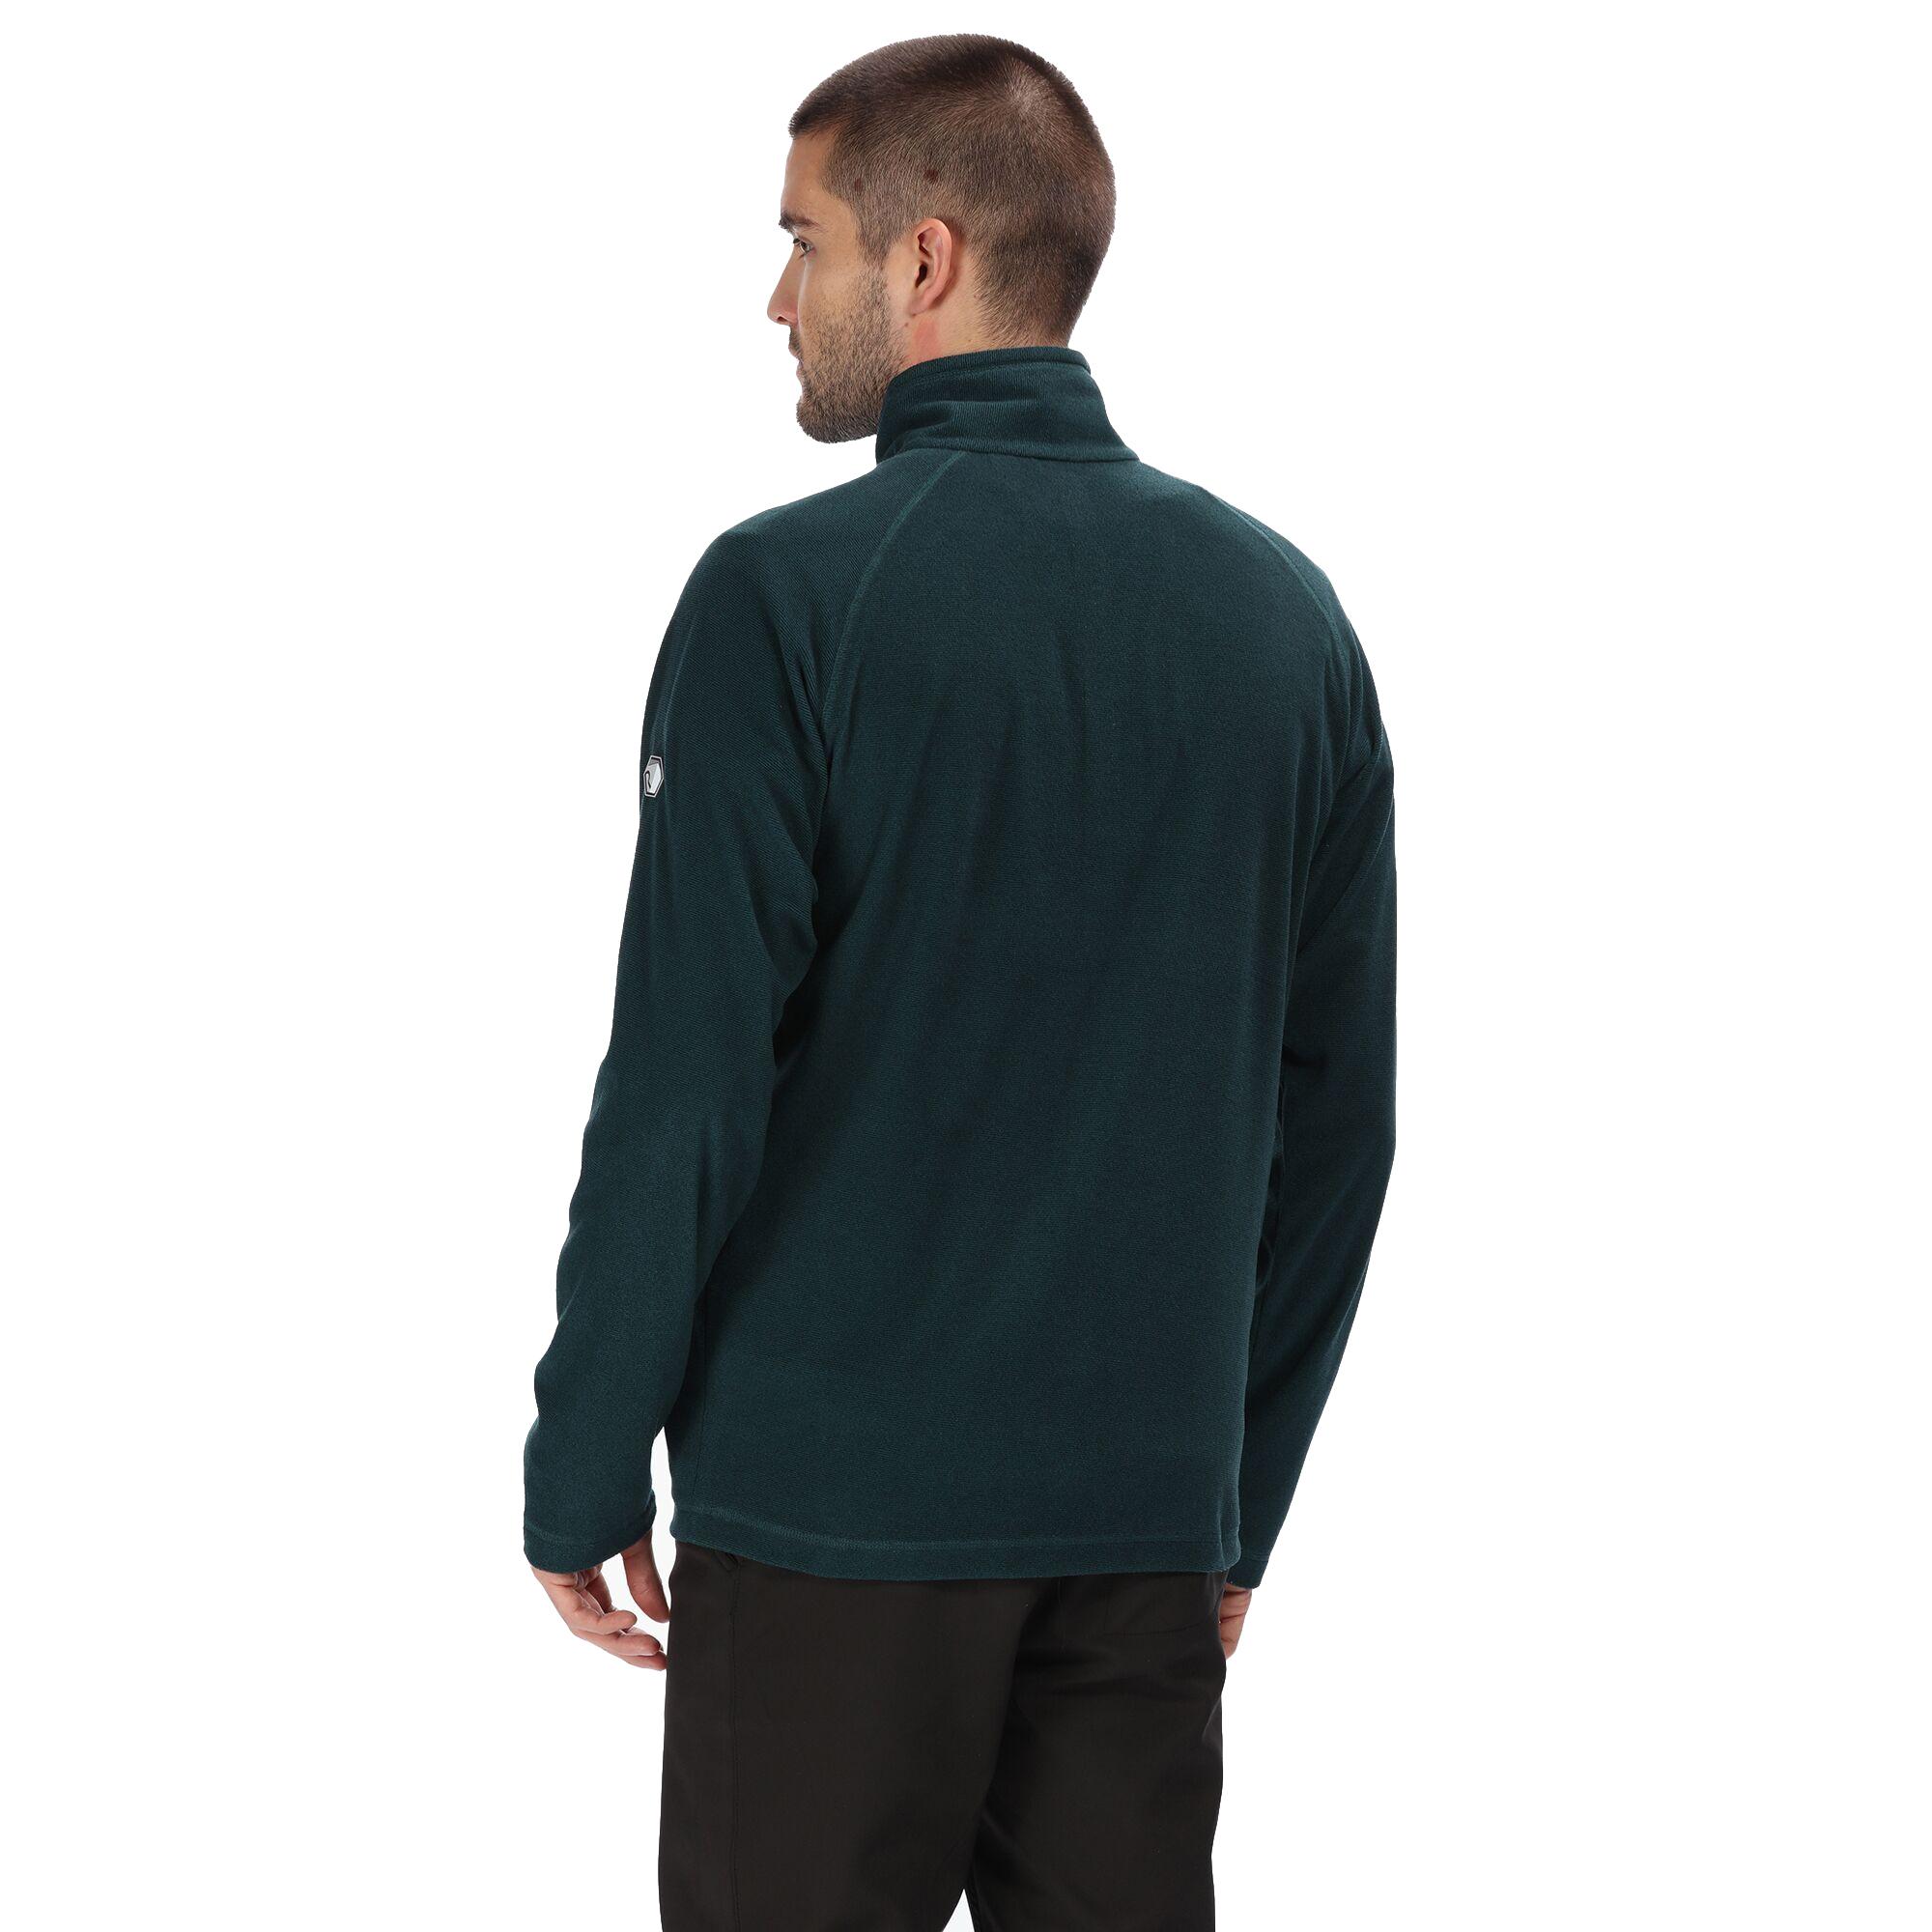 Regatta-Mens-Fleece-Jacket-amp-Hoodie-Massive-Clearance-RRP-60 thumbnail 52